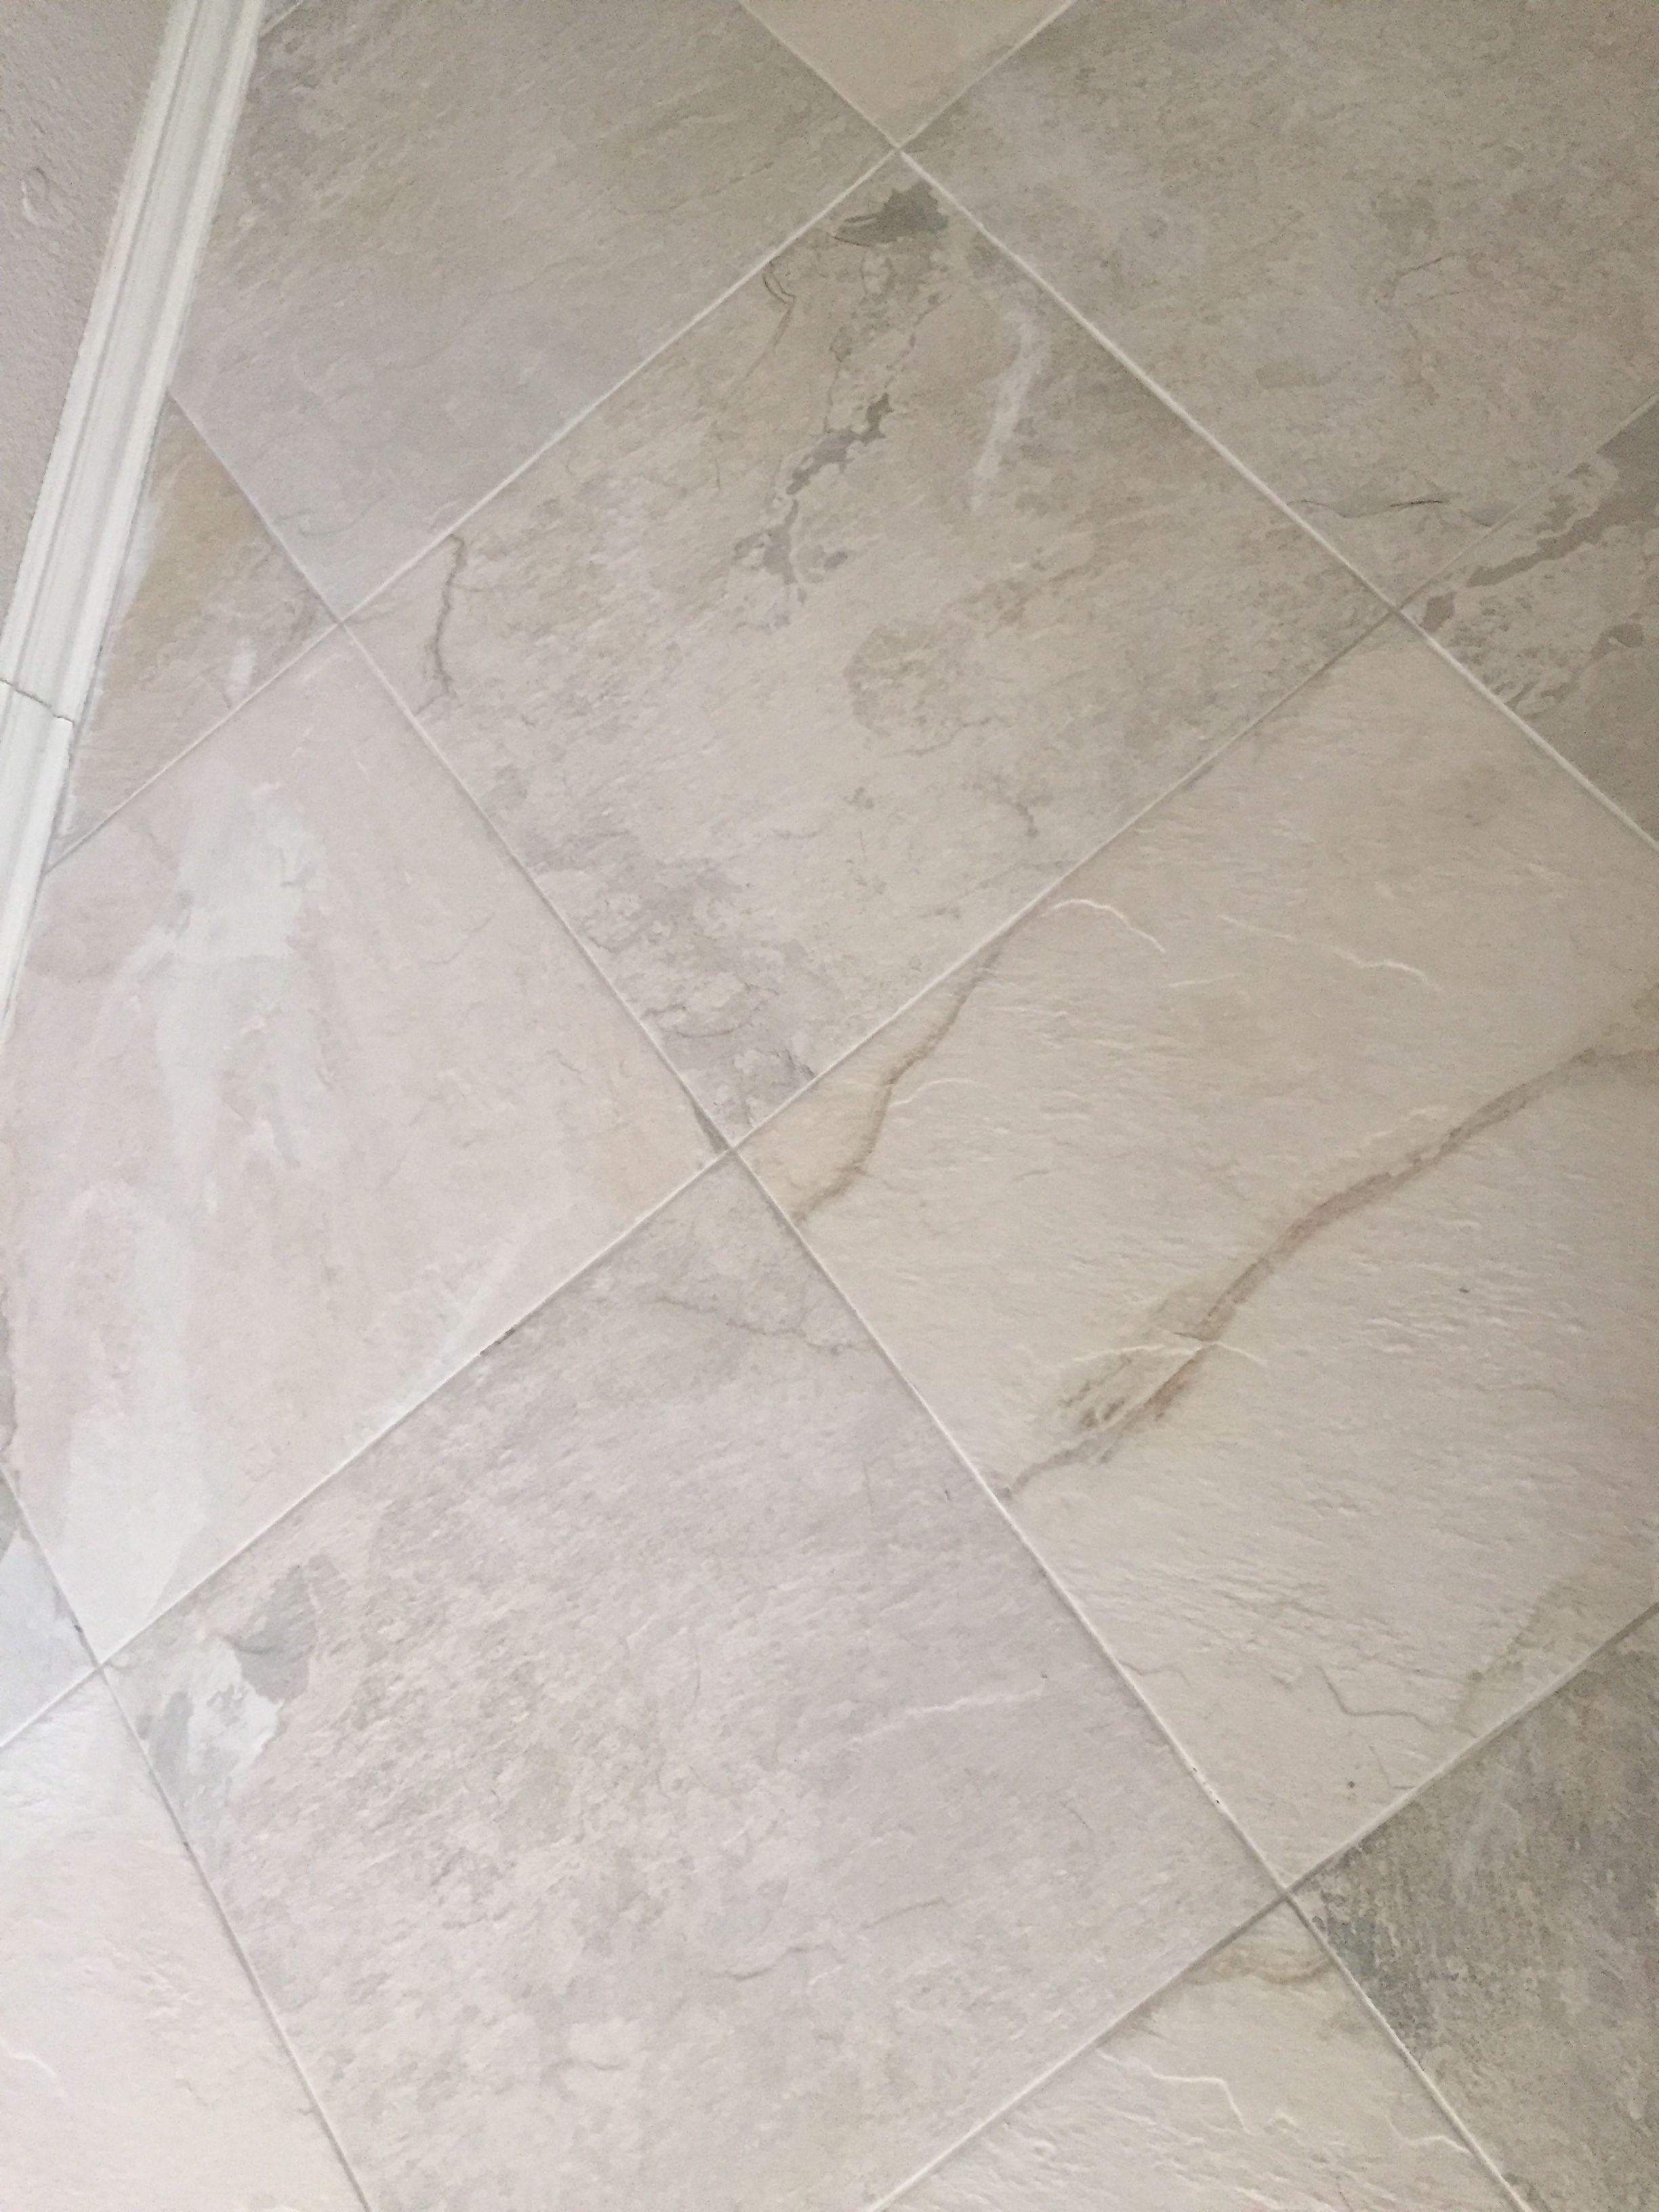 Ivetta white porcelain tile with mapei smoke unsanded grout 18 x ivetta white porcelain tile with mapei smoke unsanded grout 18 x 18 remodeling ideasbathroom remodelingfloor dailygadgetfo Choice Image